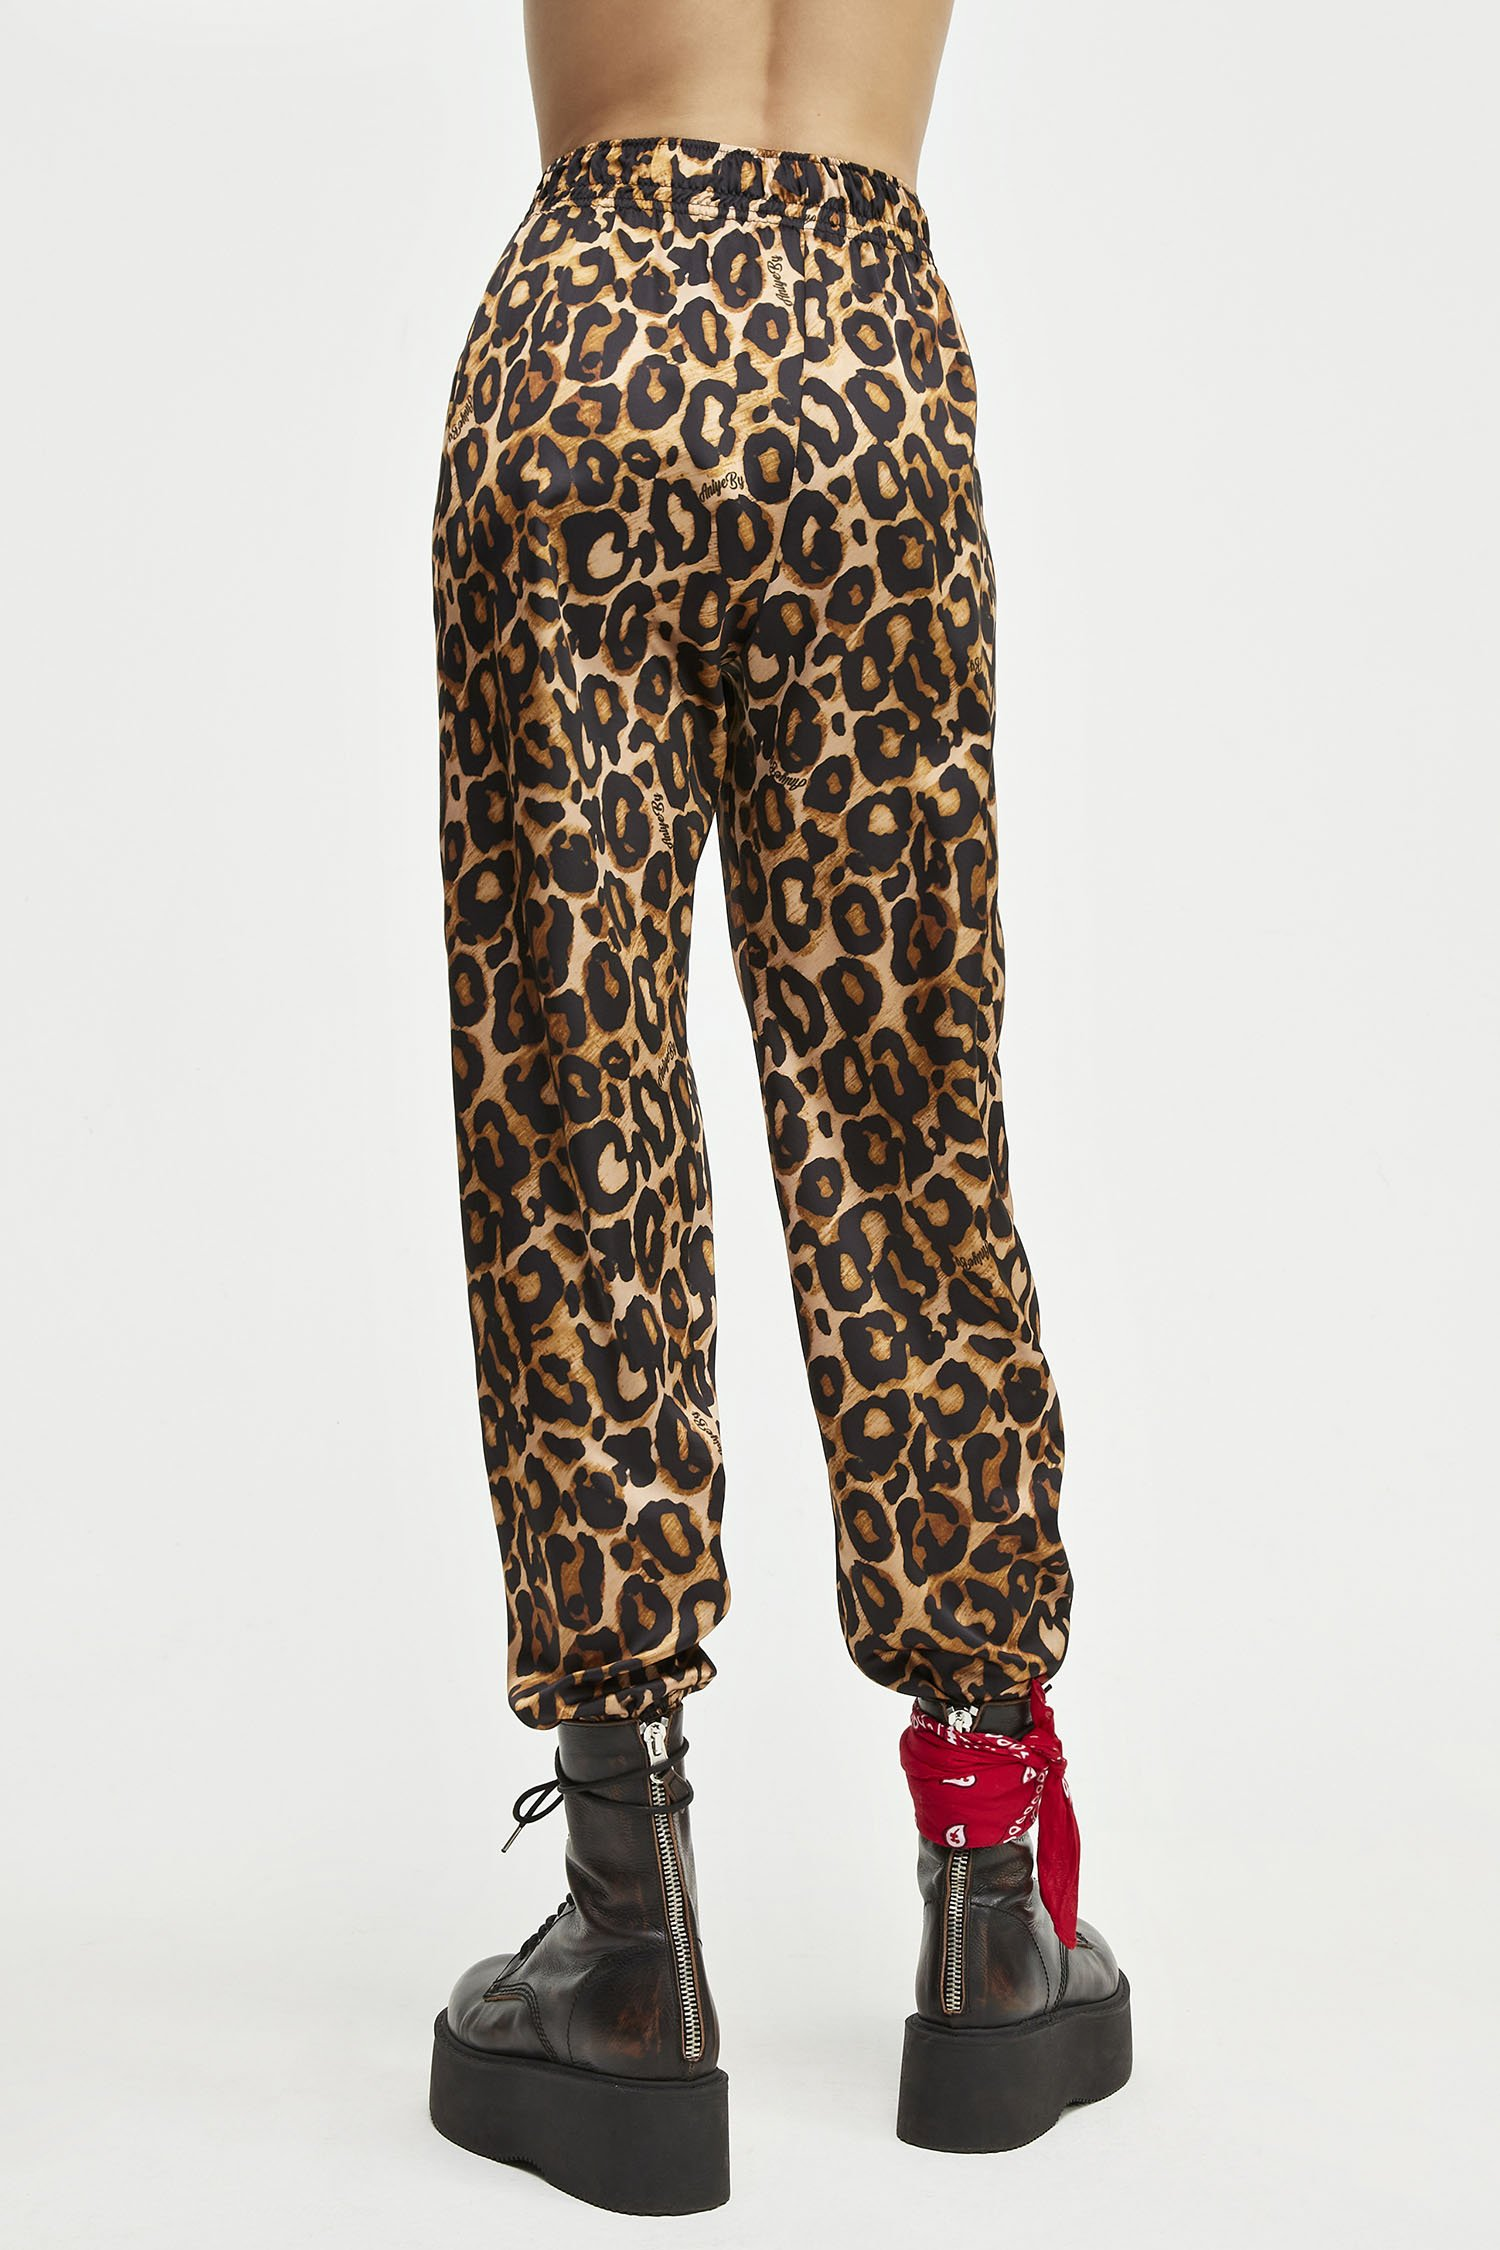 Pantalone Bila Jaguar ANIYE BY   Pantaloni   18139702040